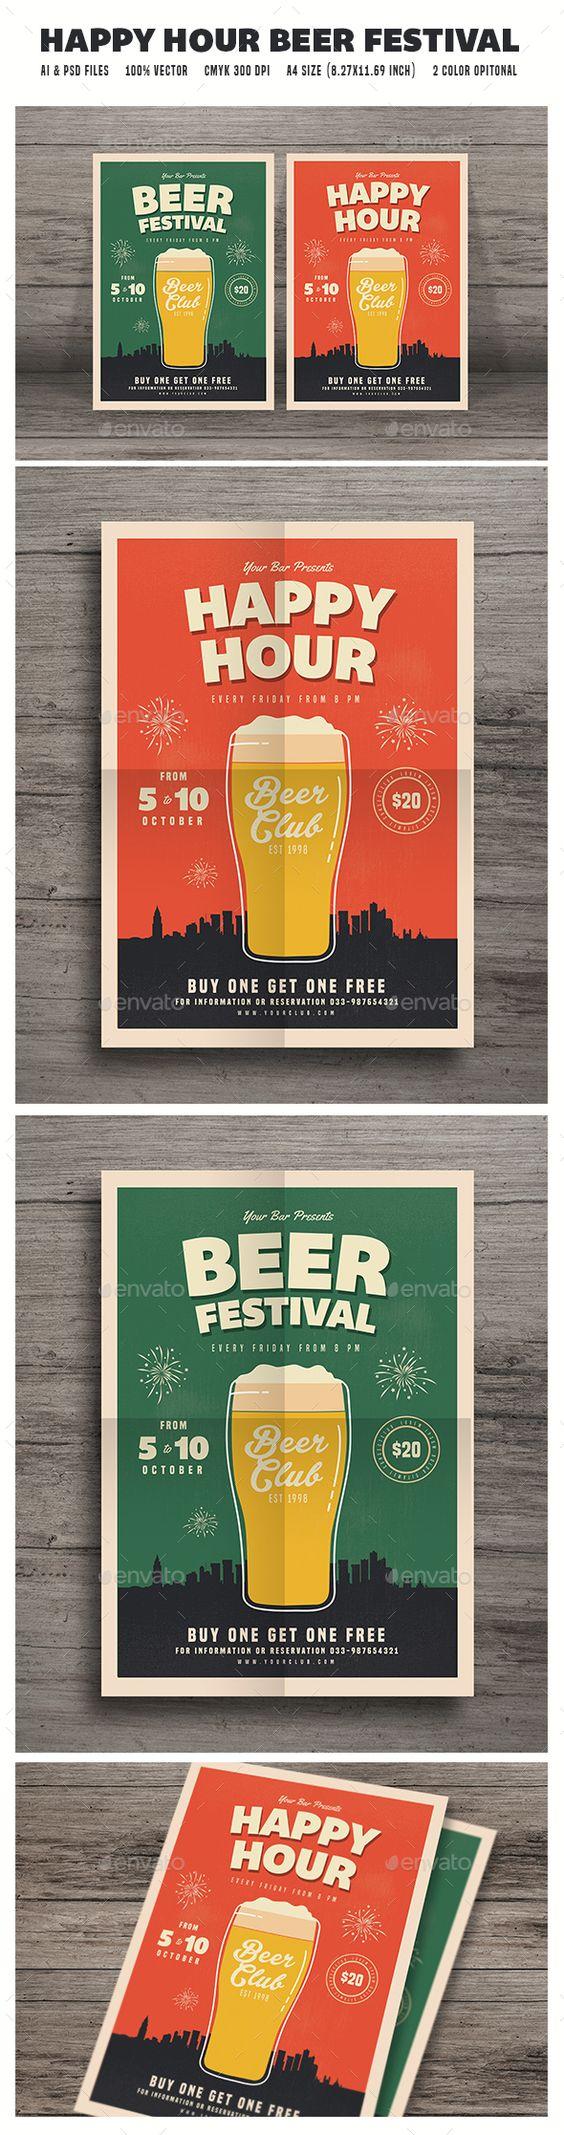 happy hour beer festival flyer fonts festivals and flyer template happy hour beer festival flyer template psd ai illustrator